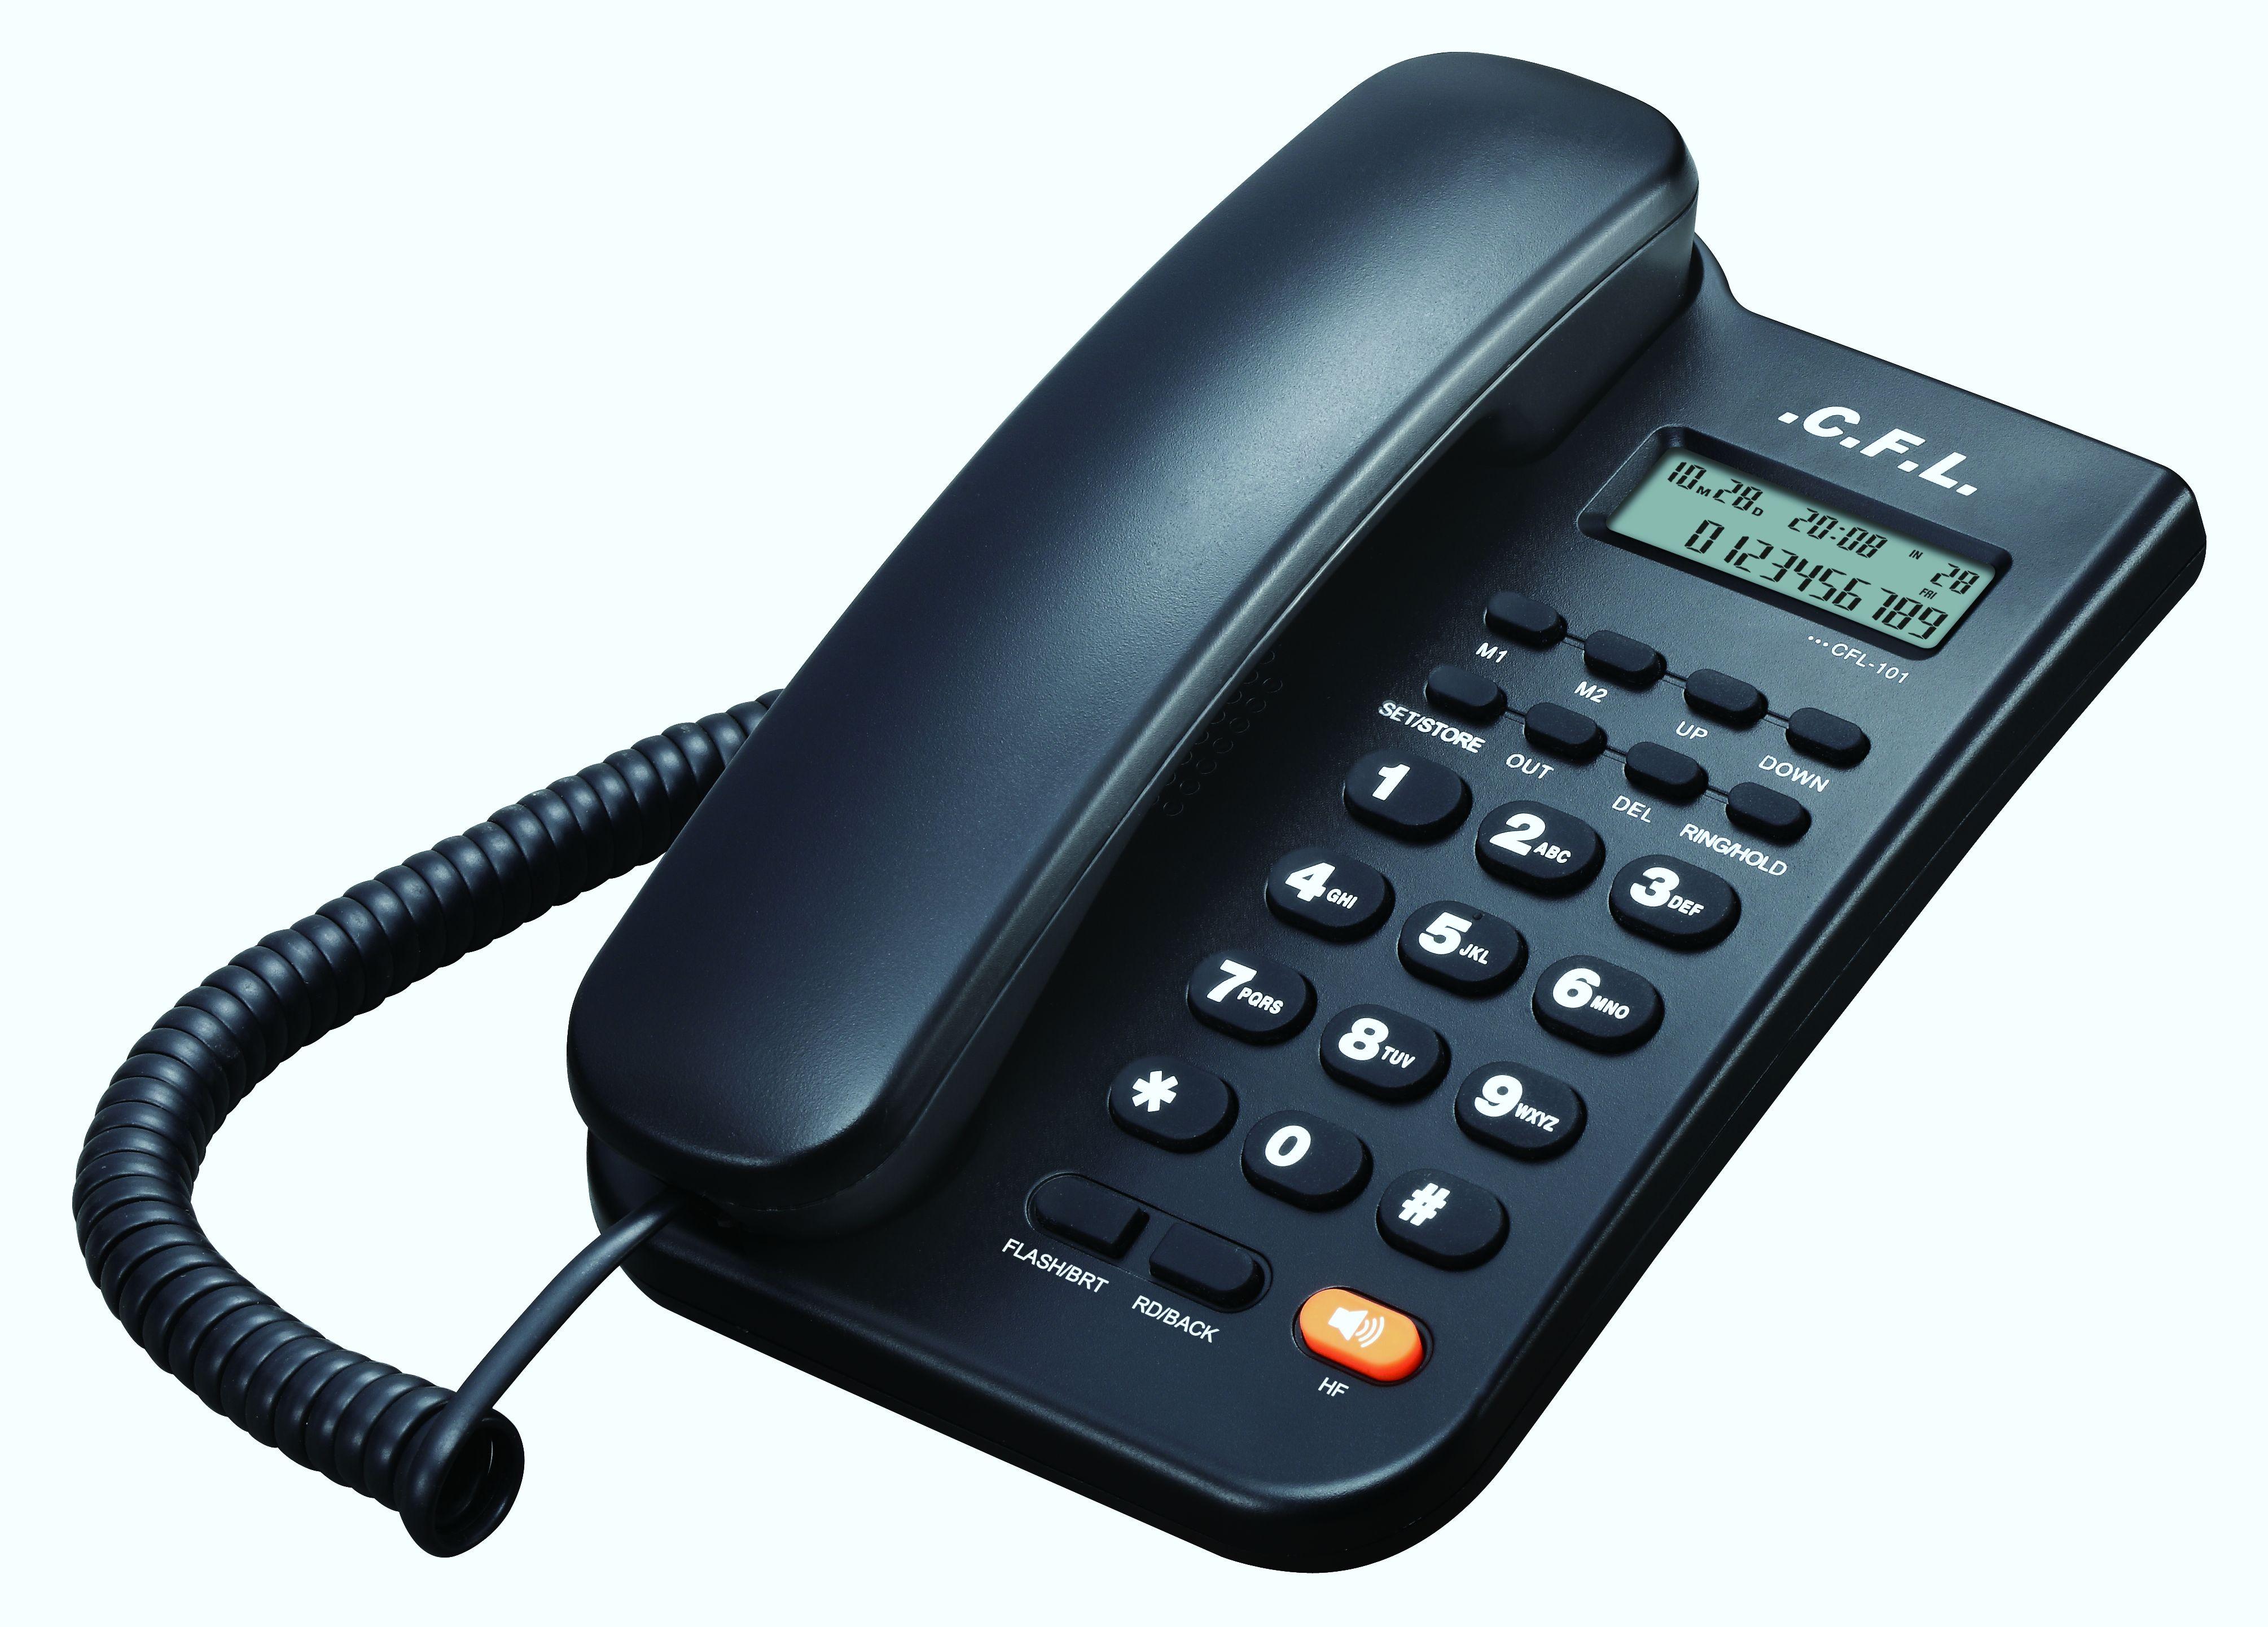 تلفن سی اف ال مدل 101